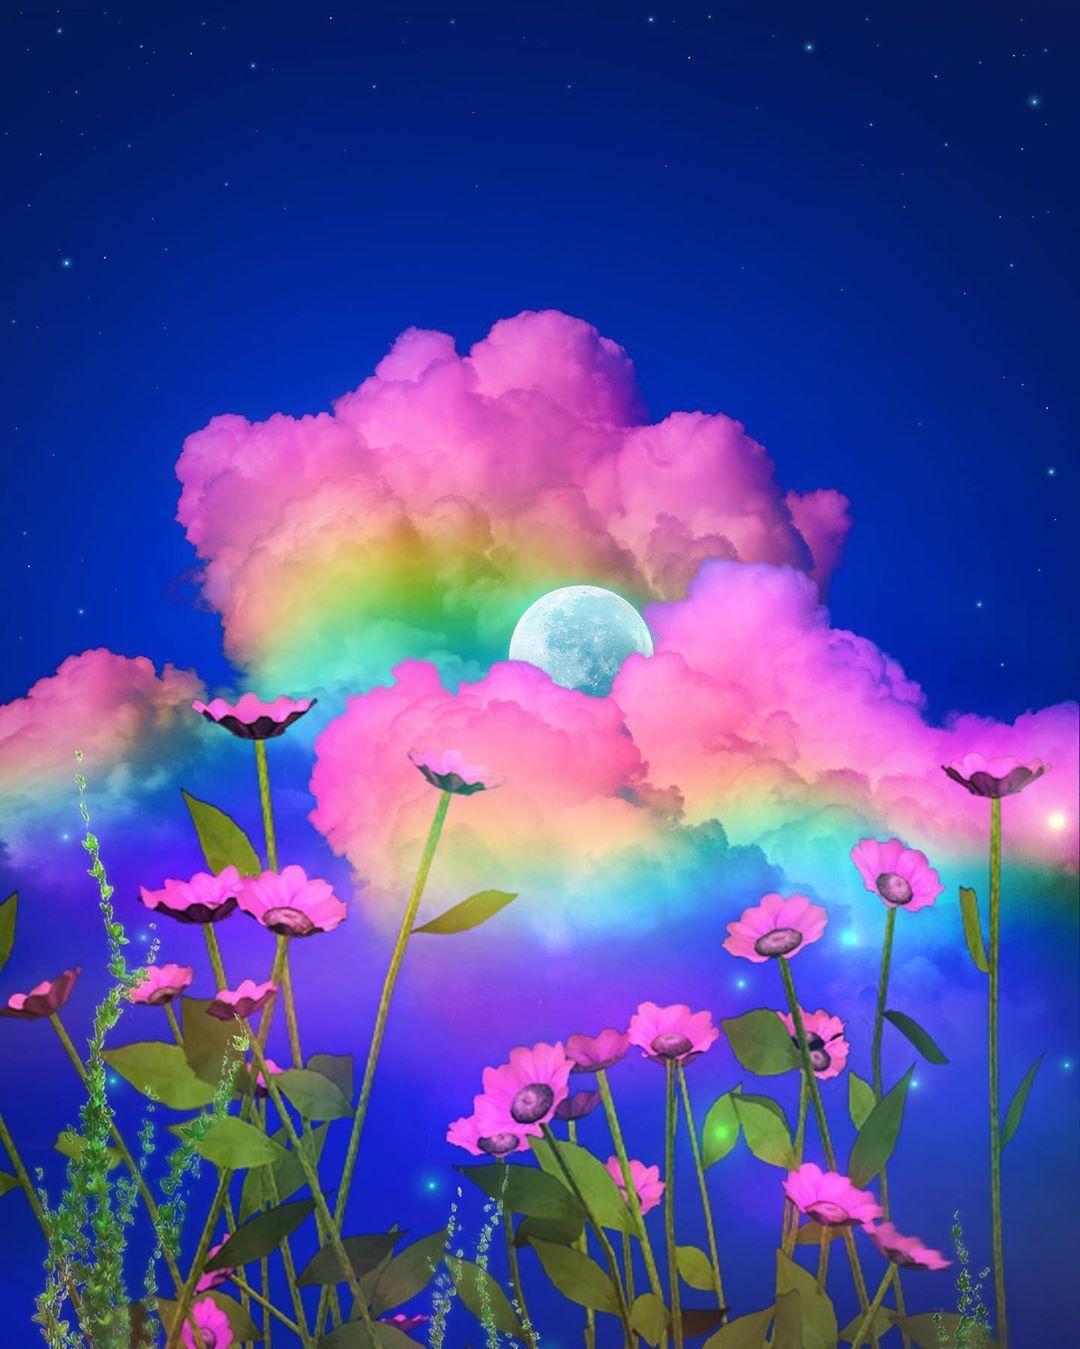 Youniverce Instagram Ryhtya Skies Valokuvaus Youniverce Youniverce Skyisland Vision Rainbow Wallpaper Rainbow Aesthetic Aesthetic Pastel Wallpaper